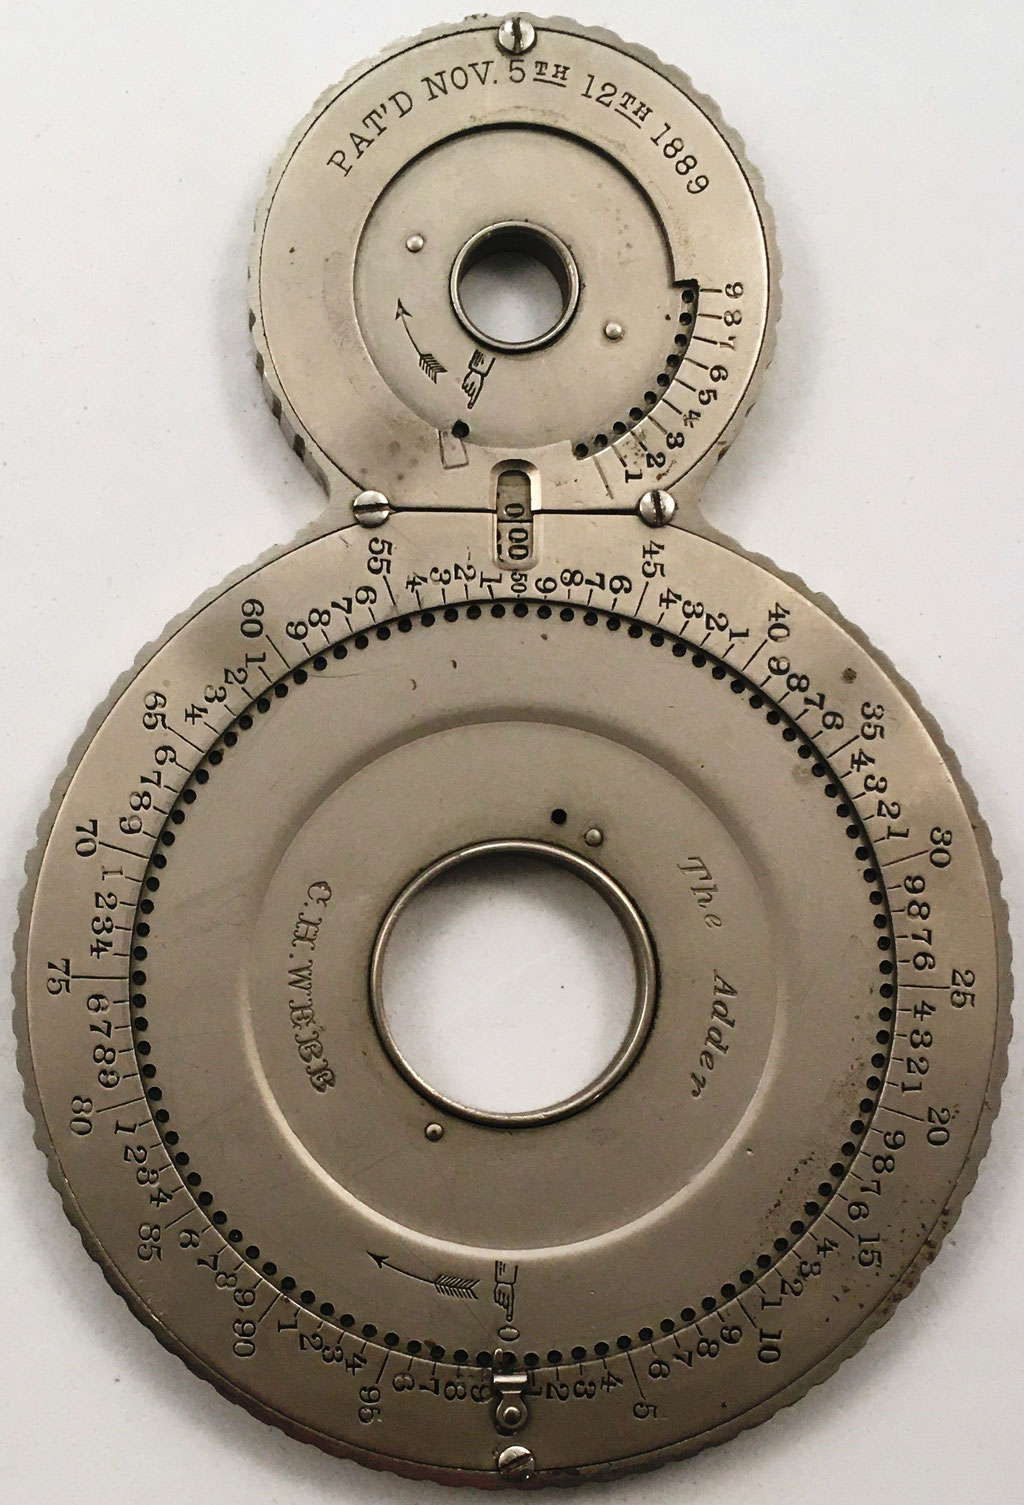 THE ADDER, C. H. WEBB (Pat'd Nov, 5th-12th 1889), modelo 2, s/n 4250, diseñado por Charles Henry WEBB, fabricado por CH Webb en Broadway (New York, USA), año 1889, 11x16 cm